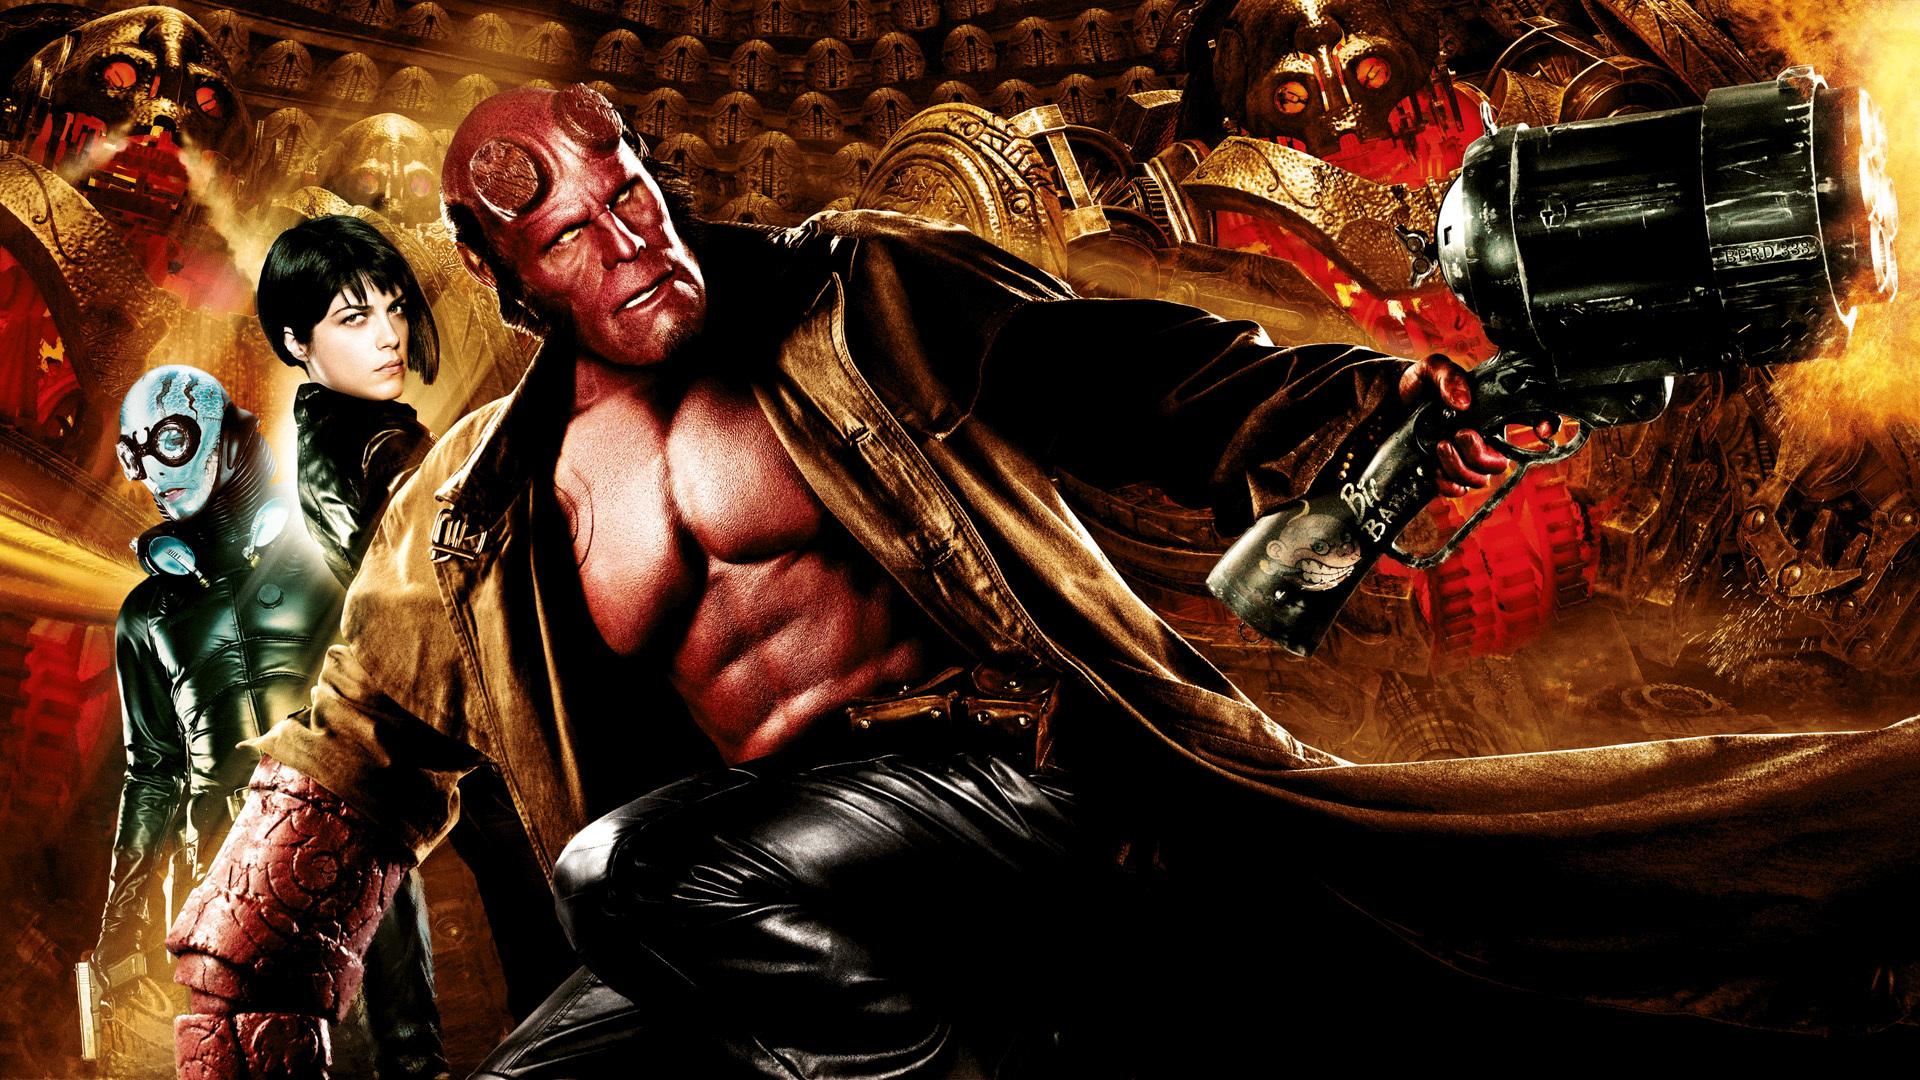 Hellboy Hd Wallpaper